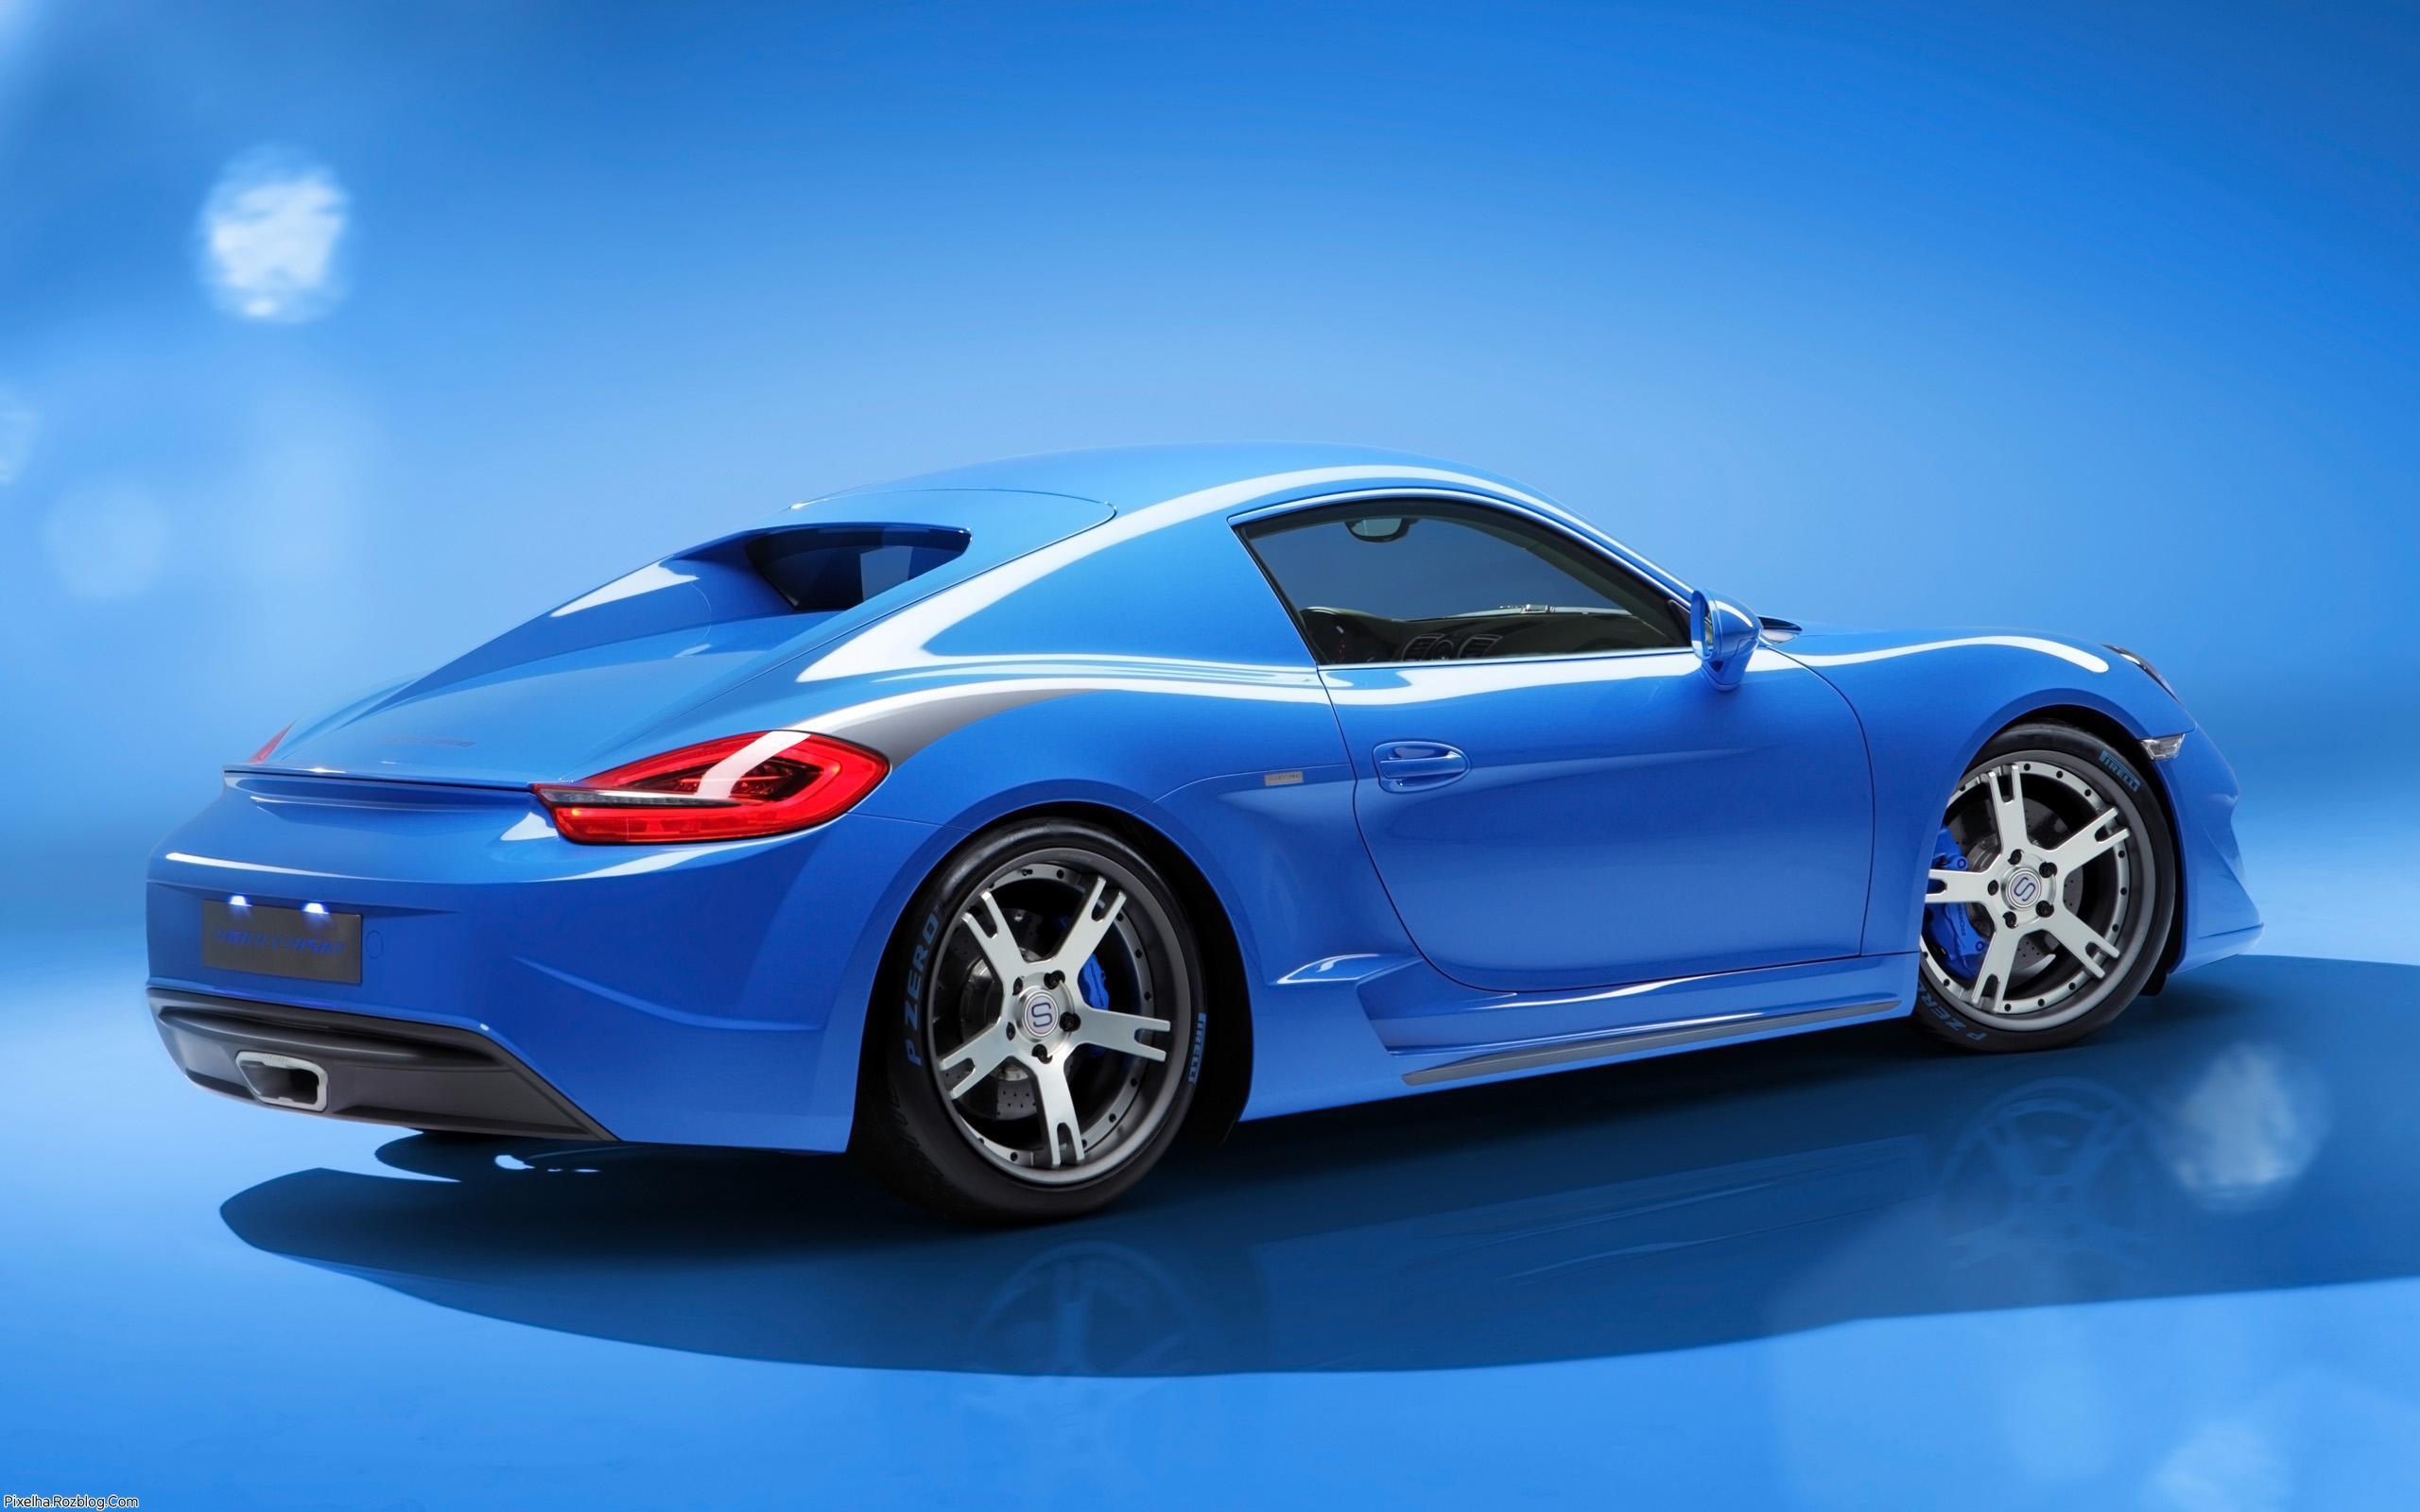 ماشین پورشه (Porsche)